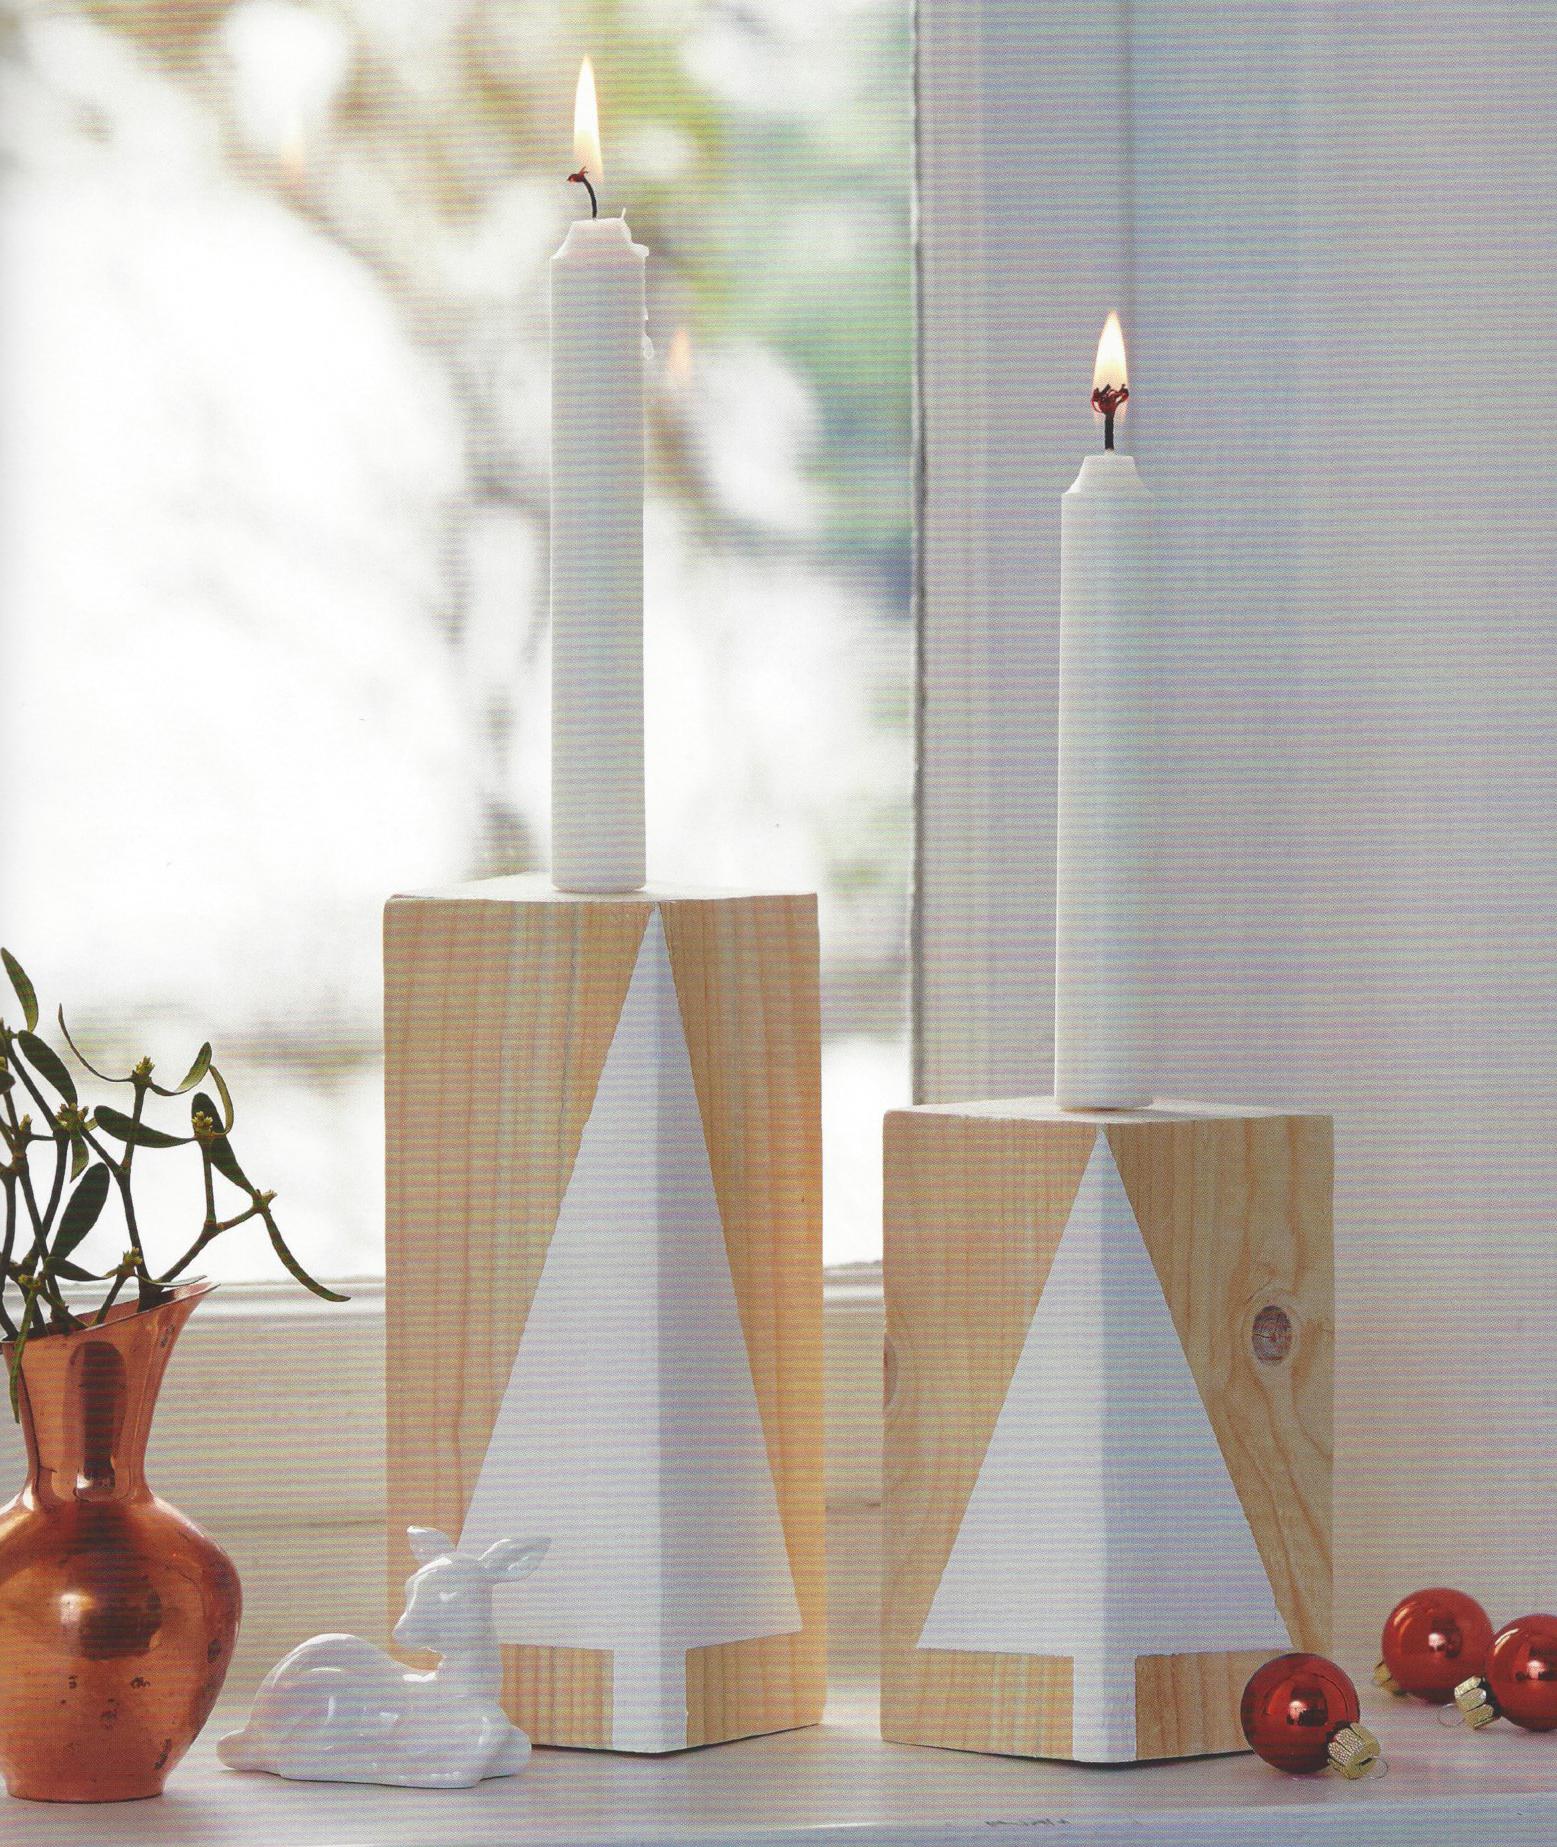 Holz-Kerze Beispiels-Bild Buch Topp-Verlag